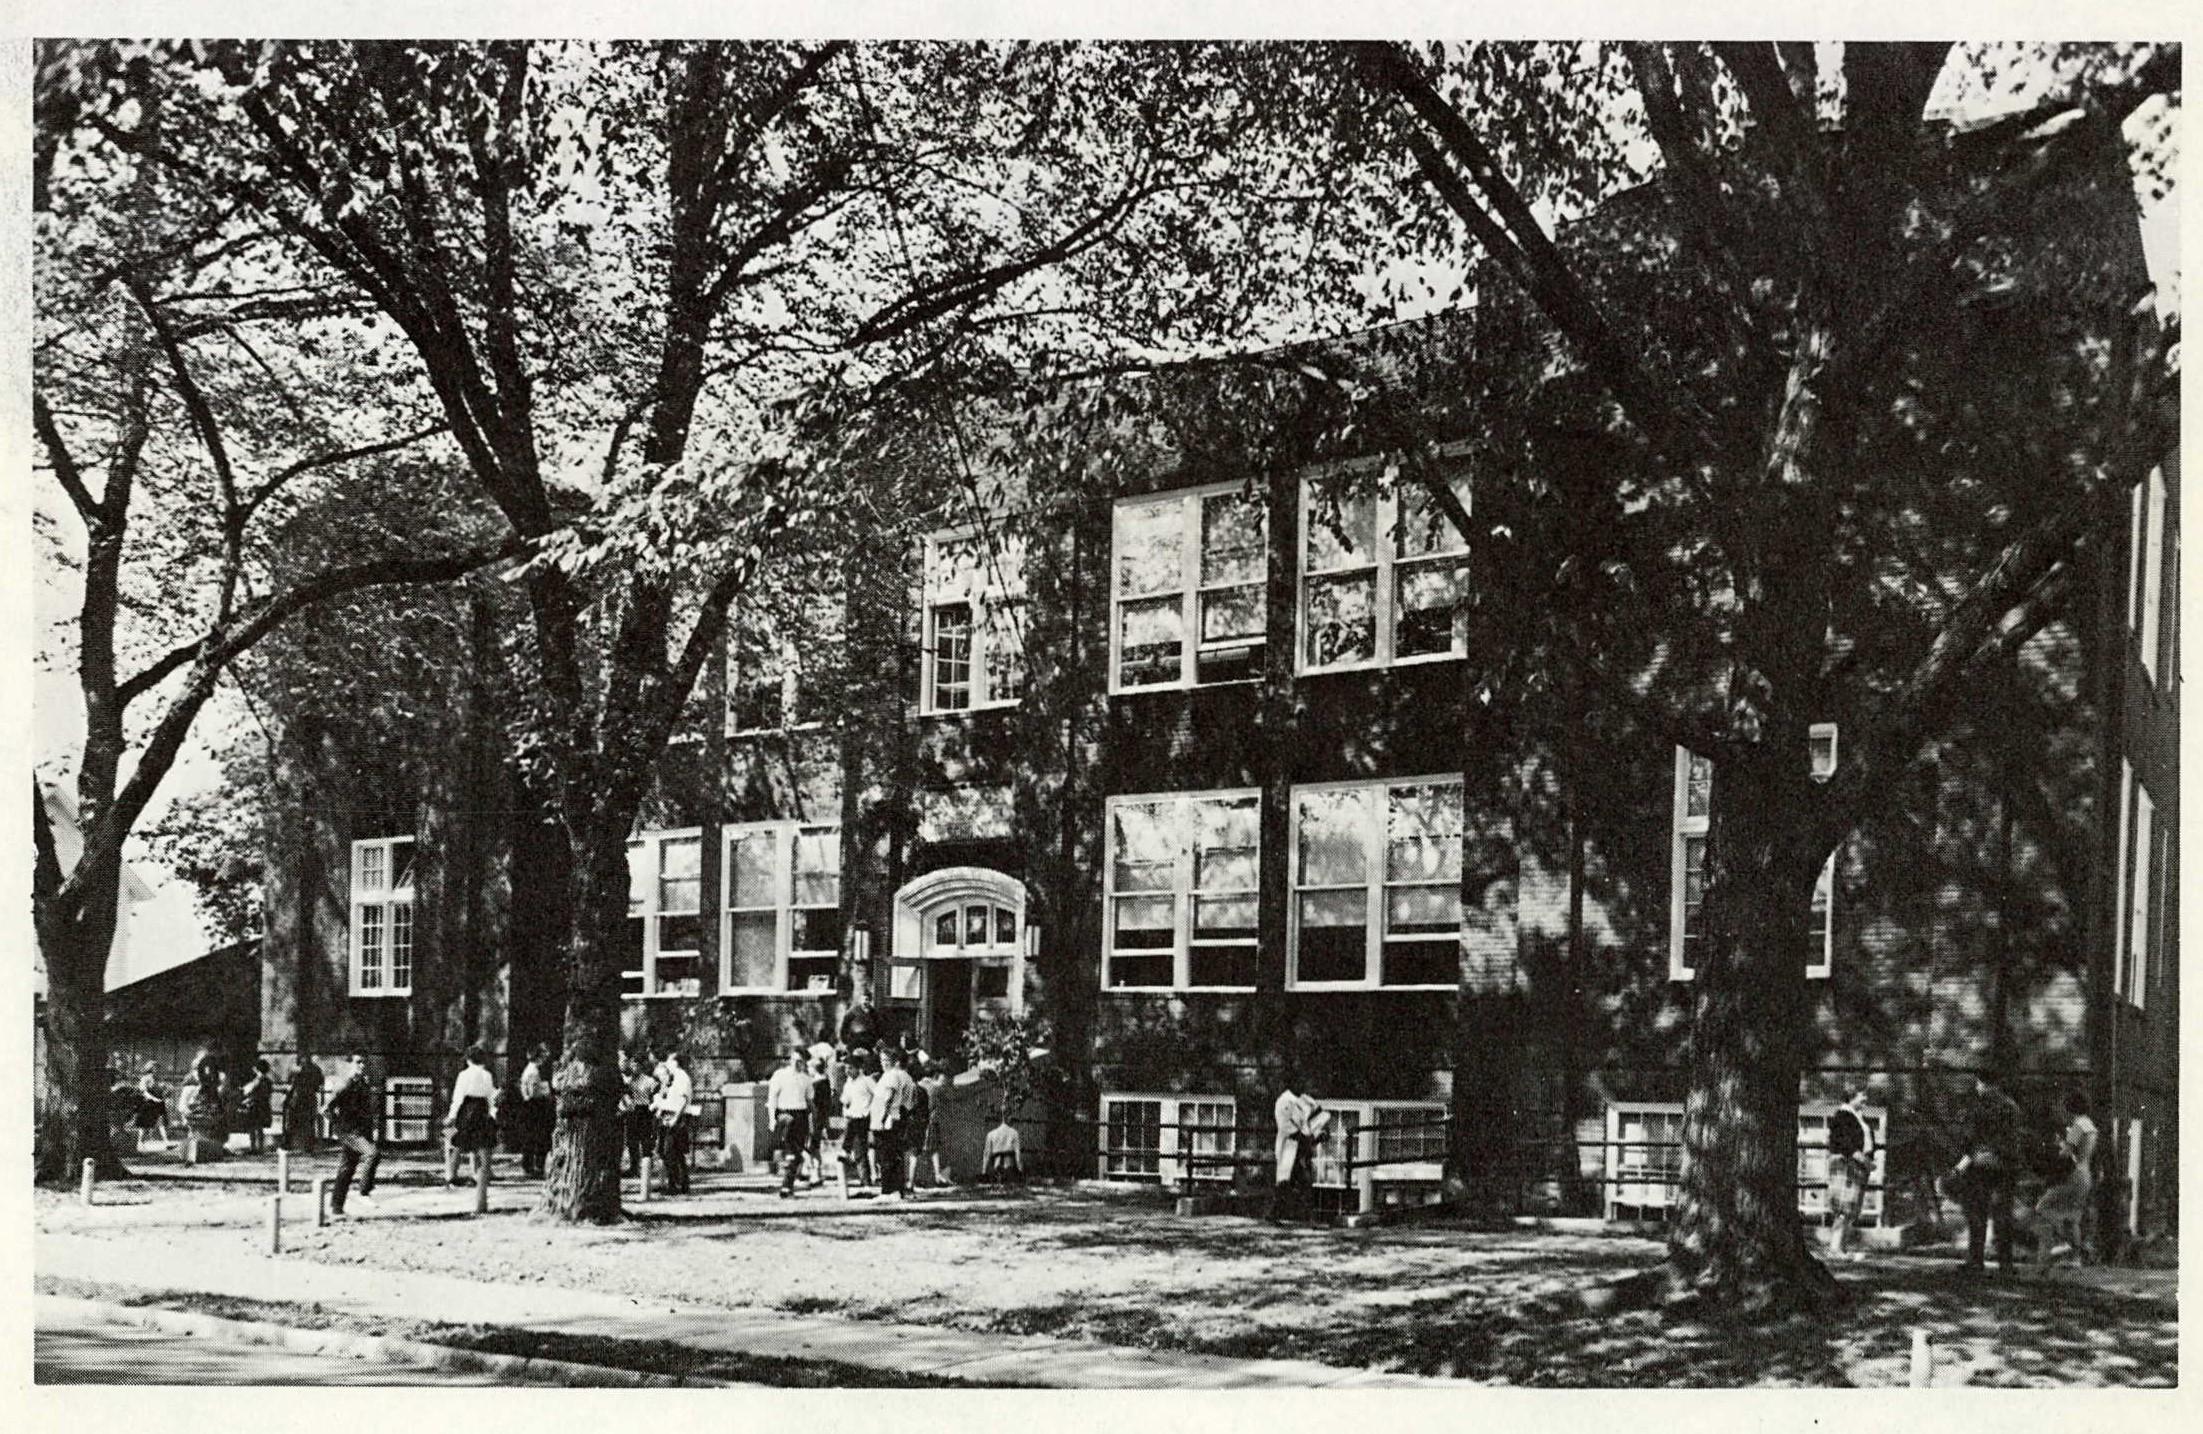 Coraopolis High School - 1964 Review.jpg